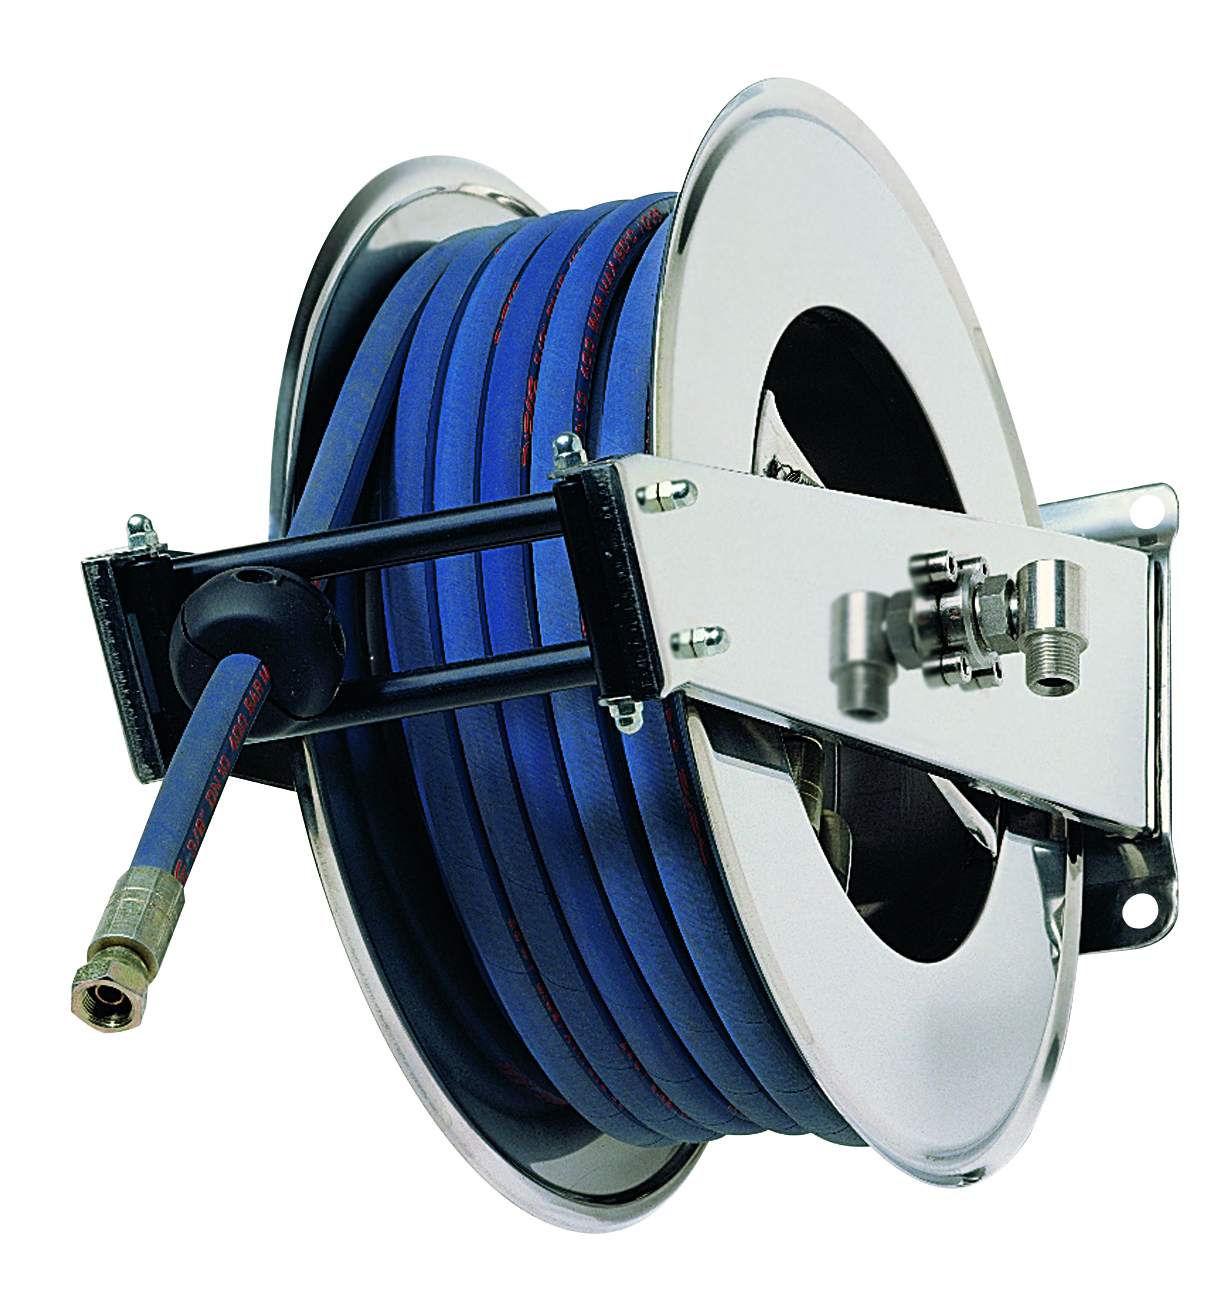 AV1500 - Hose reels Water Standard Pressure 0-200 Bar/0-2900 PSI